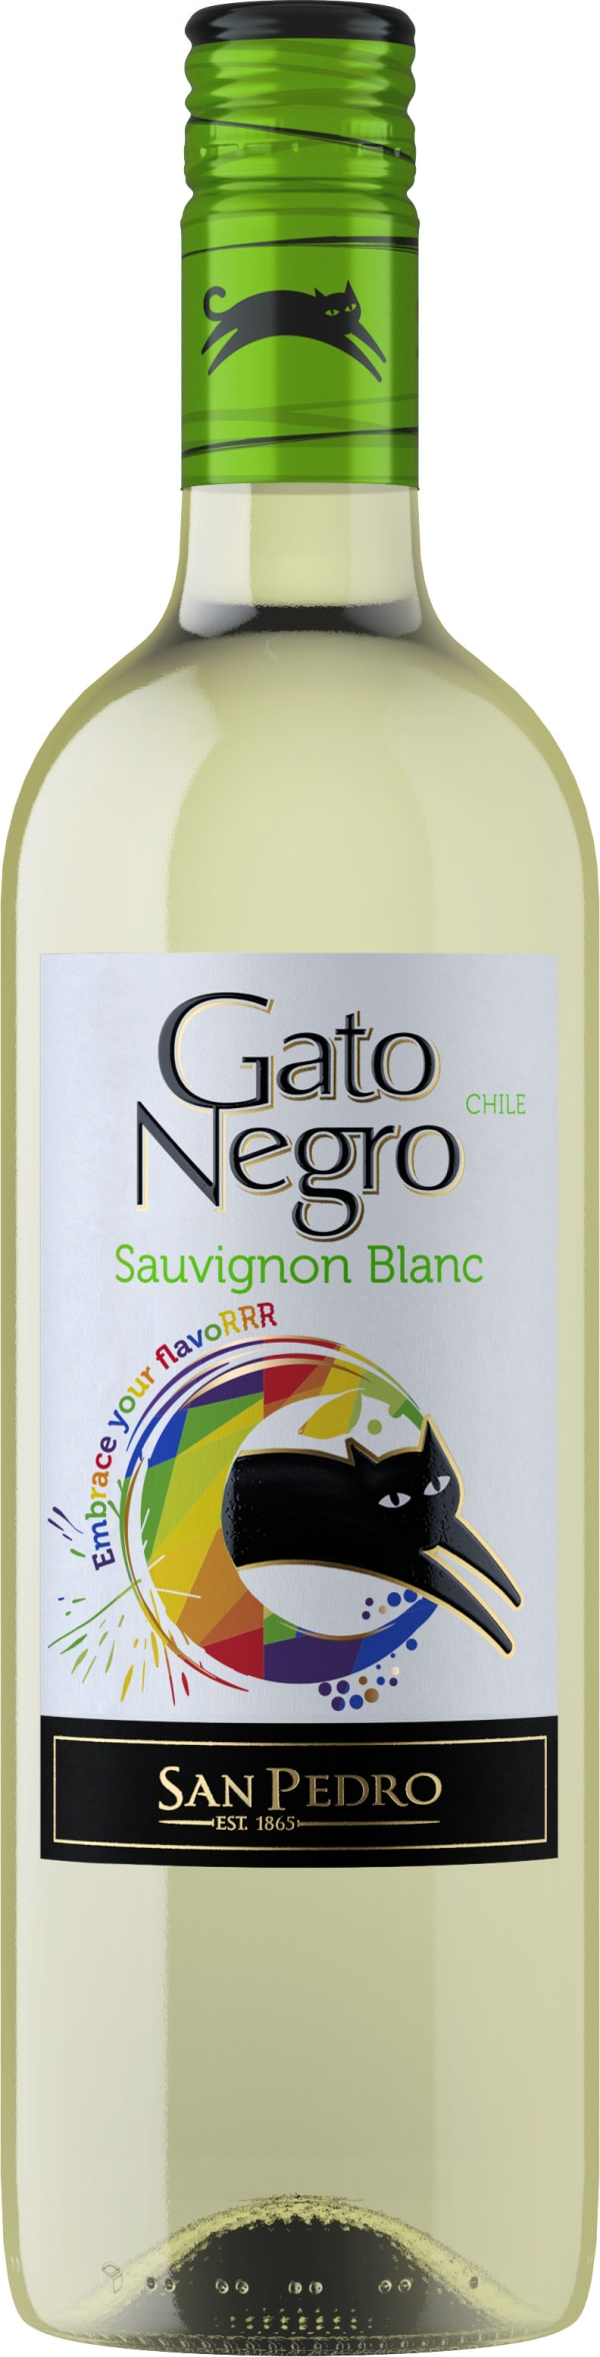 Gato Negro Sauvignon Blanc 2017